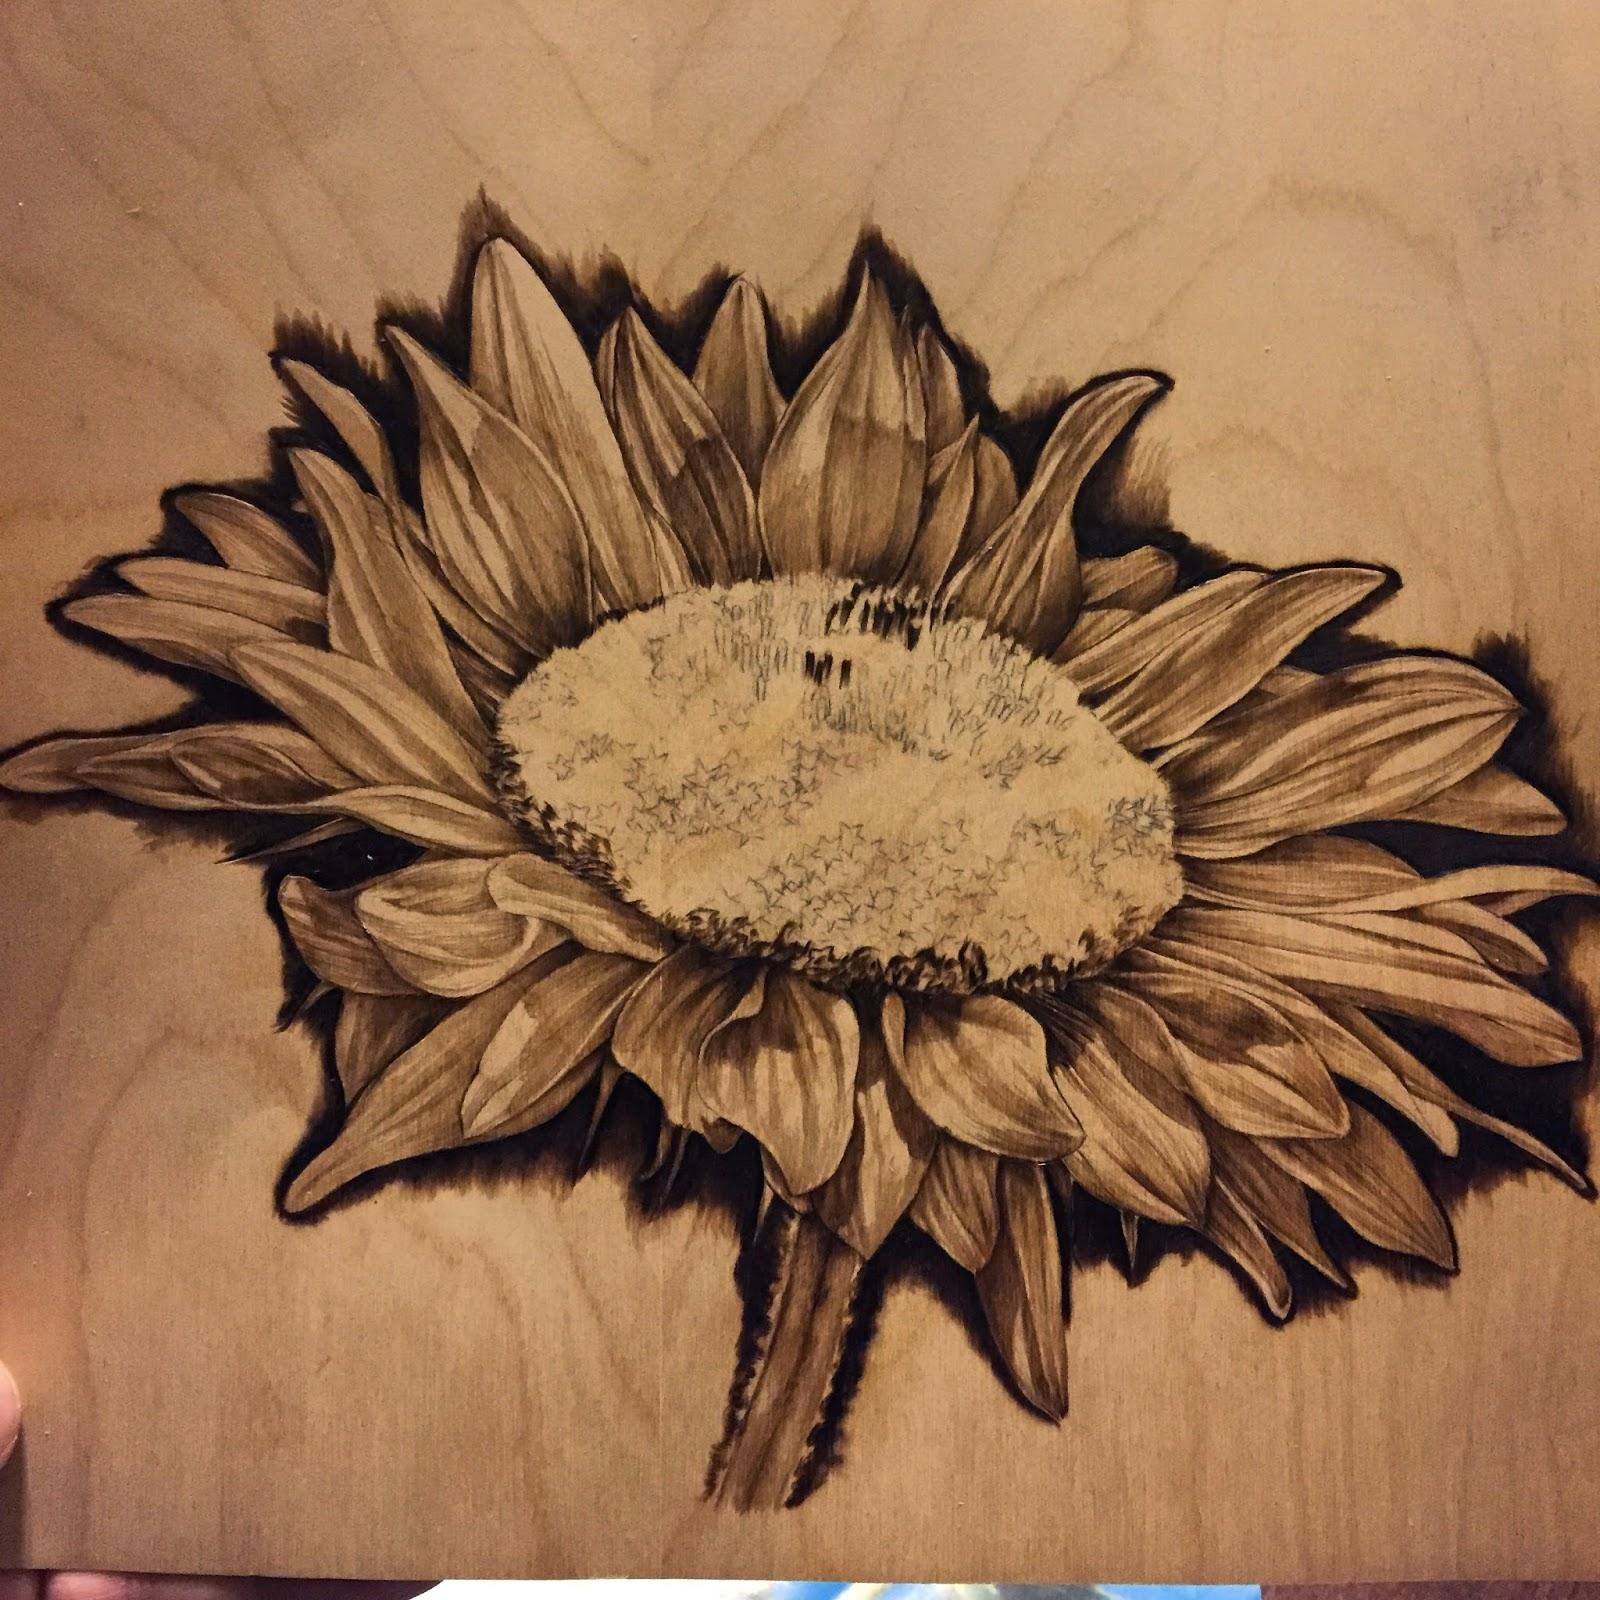 My Pyrography: Pyrography Art by Adin Begic - Wood-Burning ...